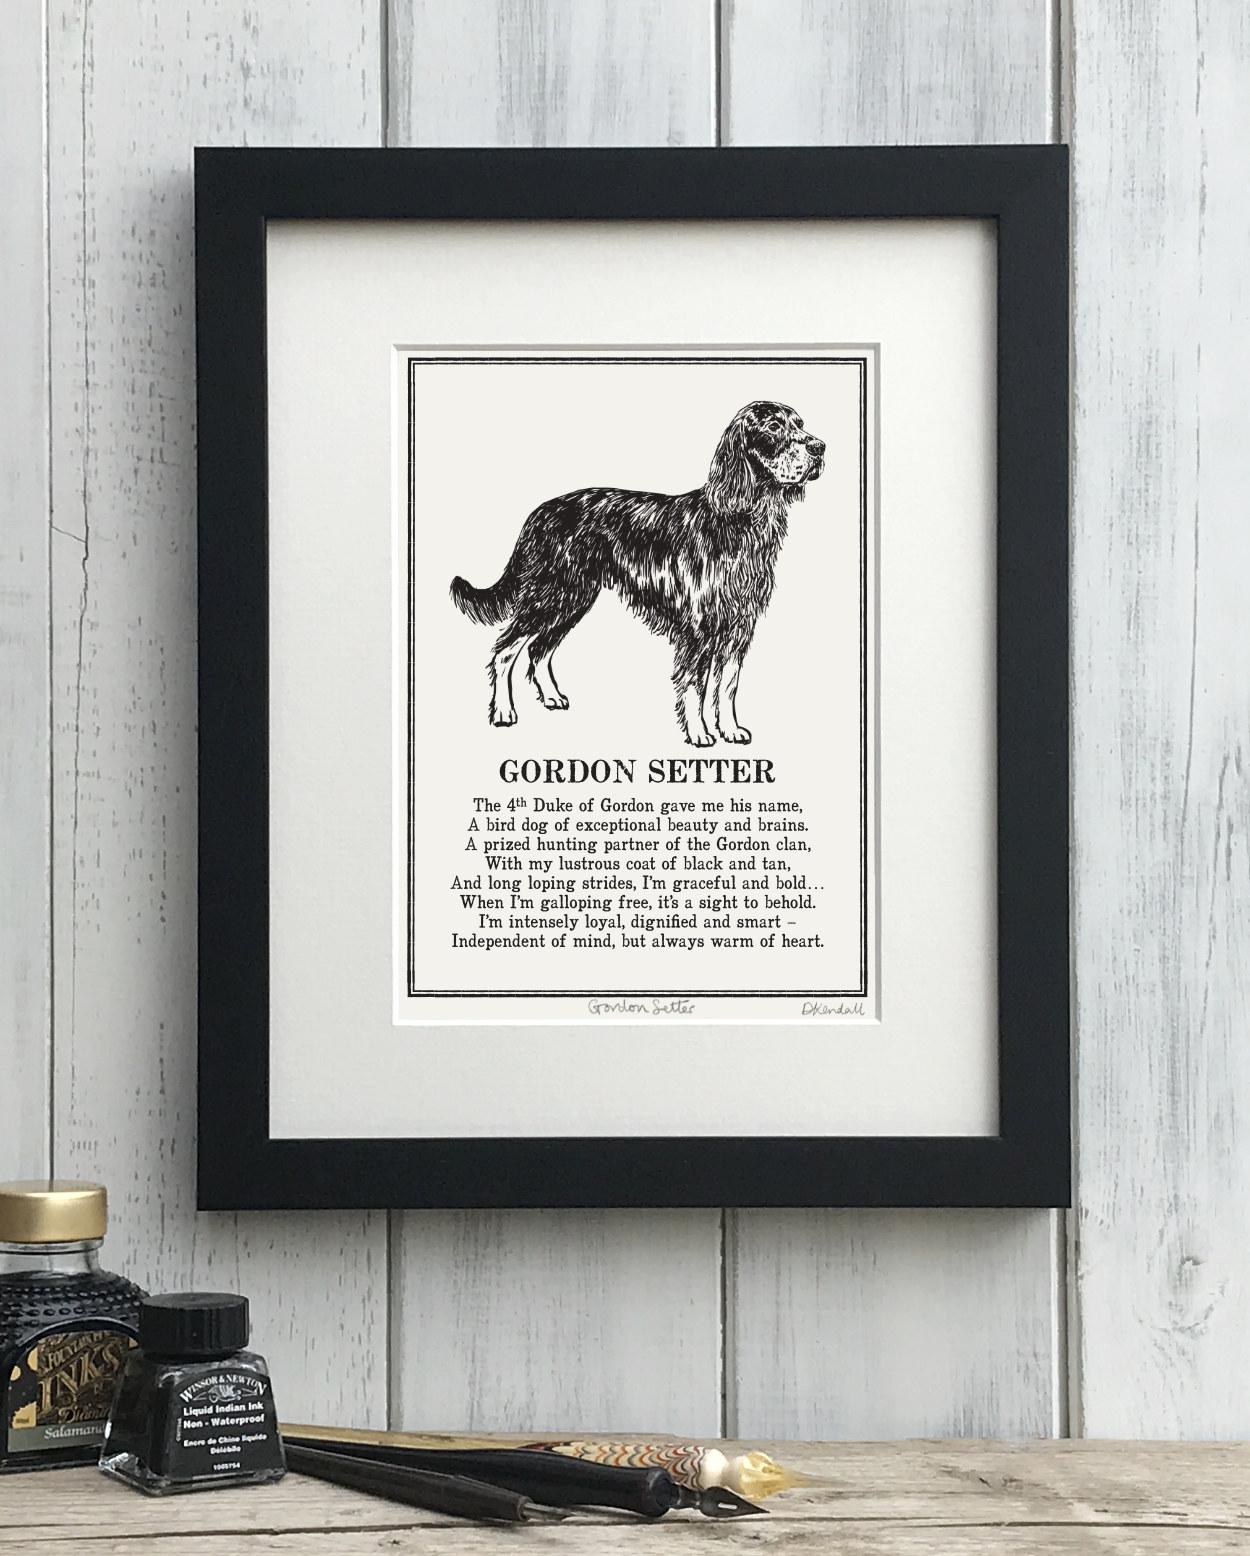 Gordon Setter print illustrated poem by The Enlightened Hound